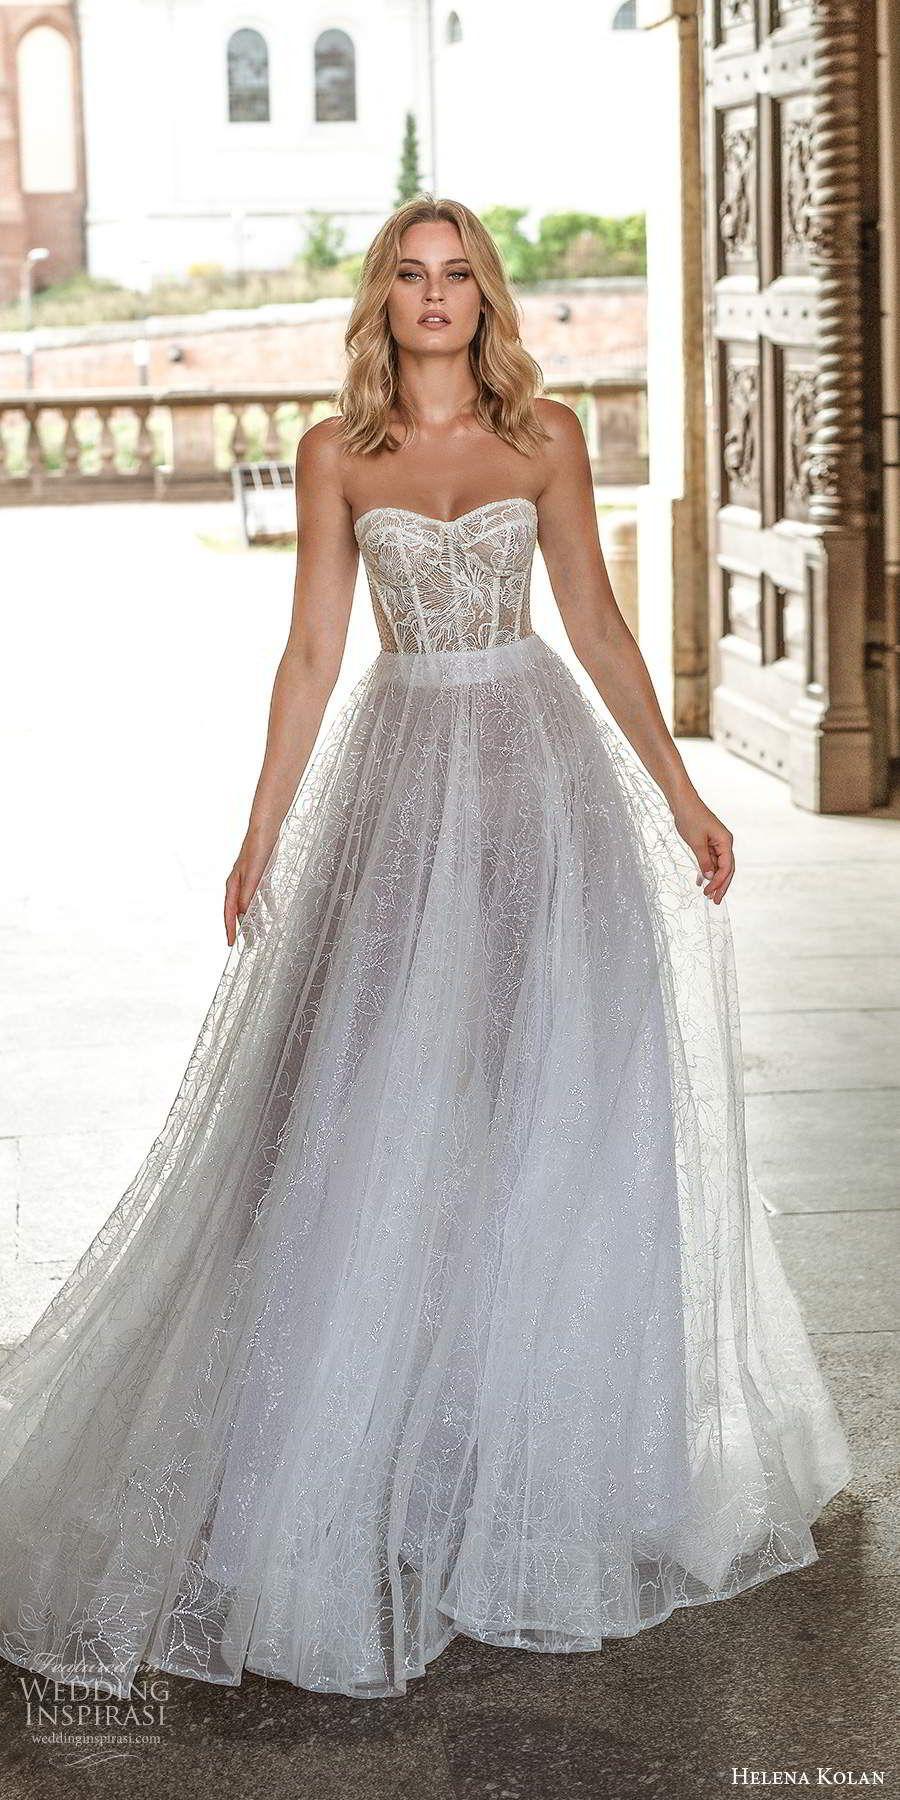 David S Bridal Strapless Satin Corset Gown Designer Wedding Dresses Davids Bridal Wedding Dresses Cheap Wedding Dress